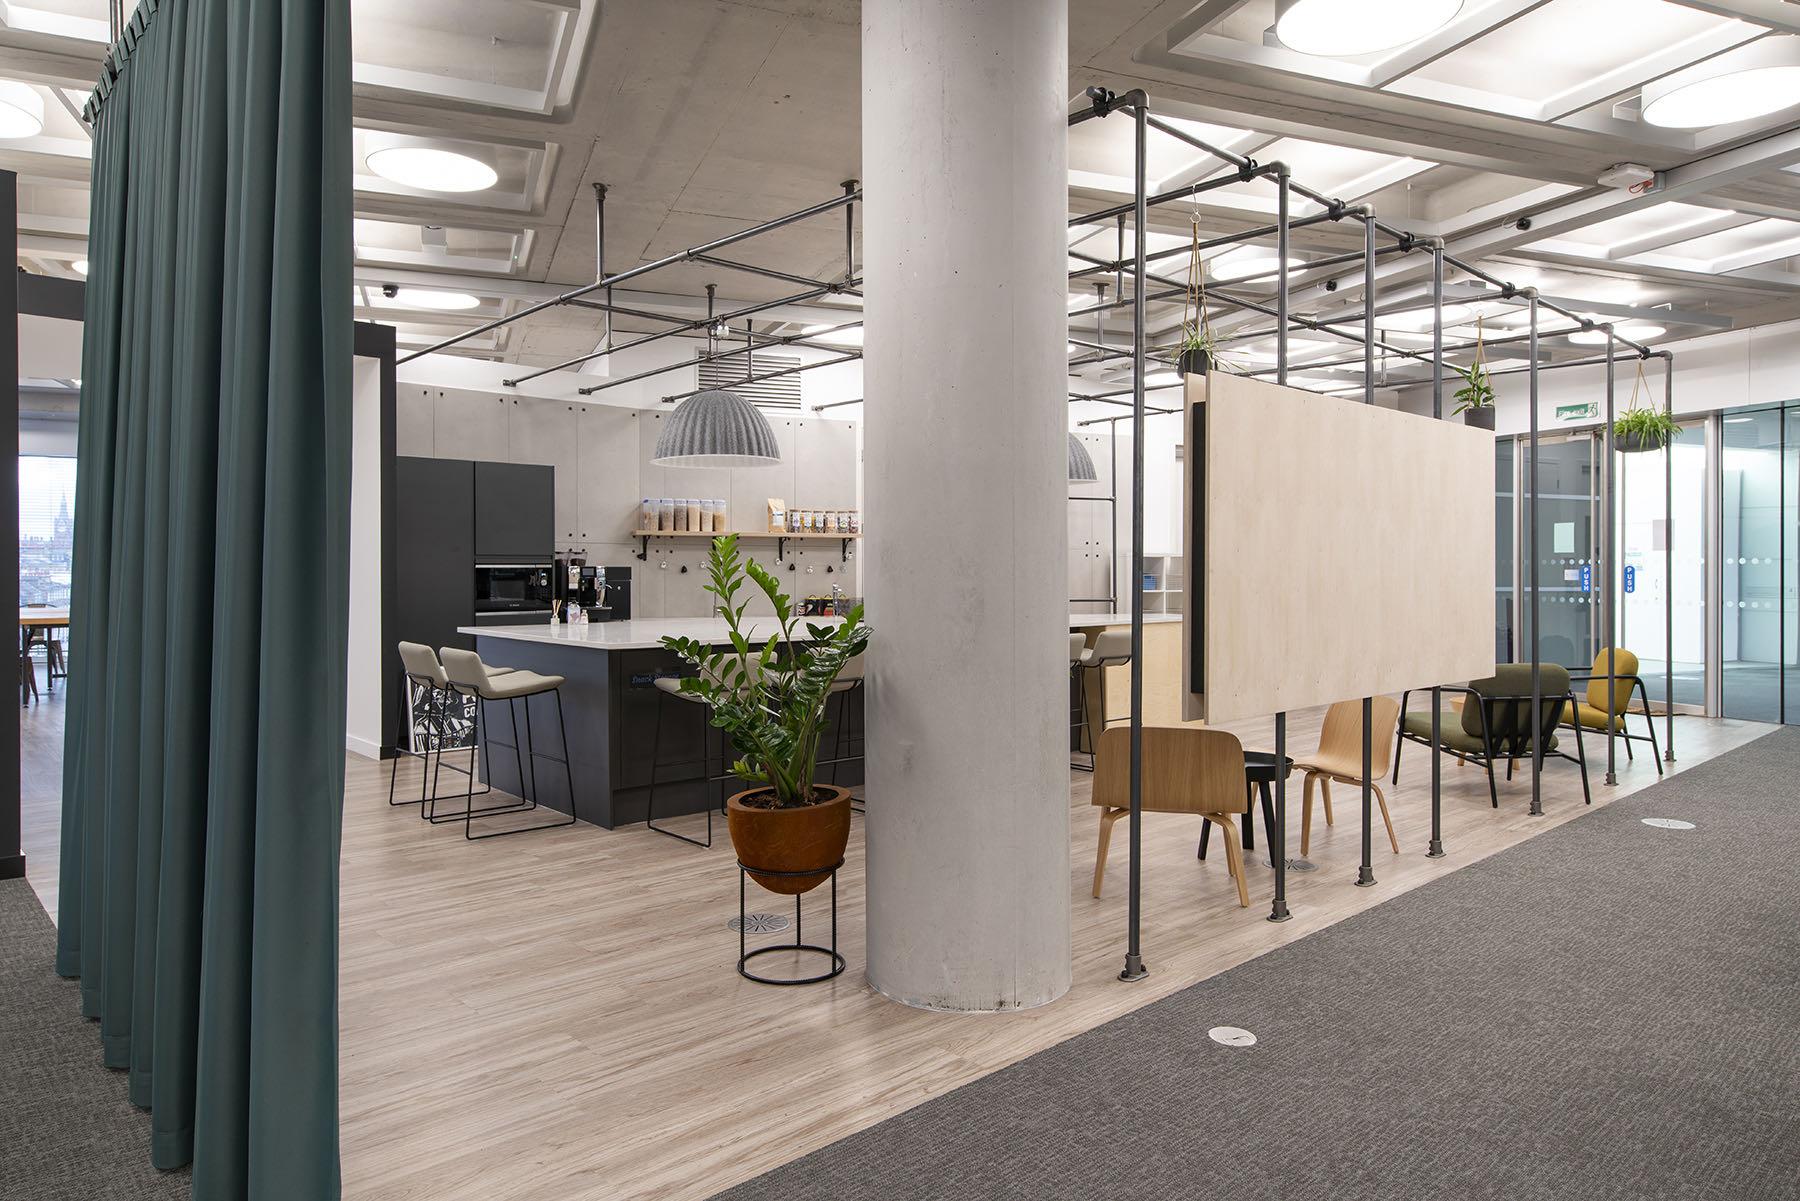 metapack-london-office-16